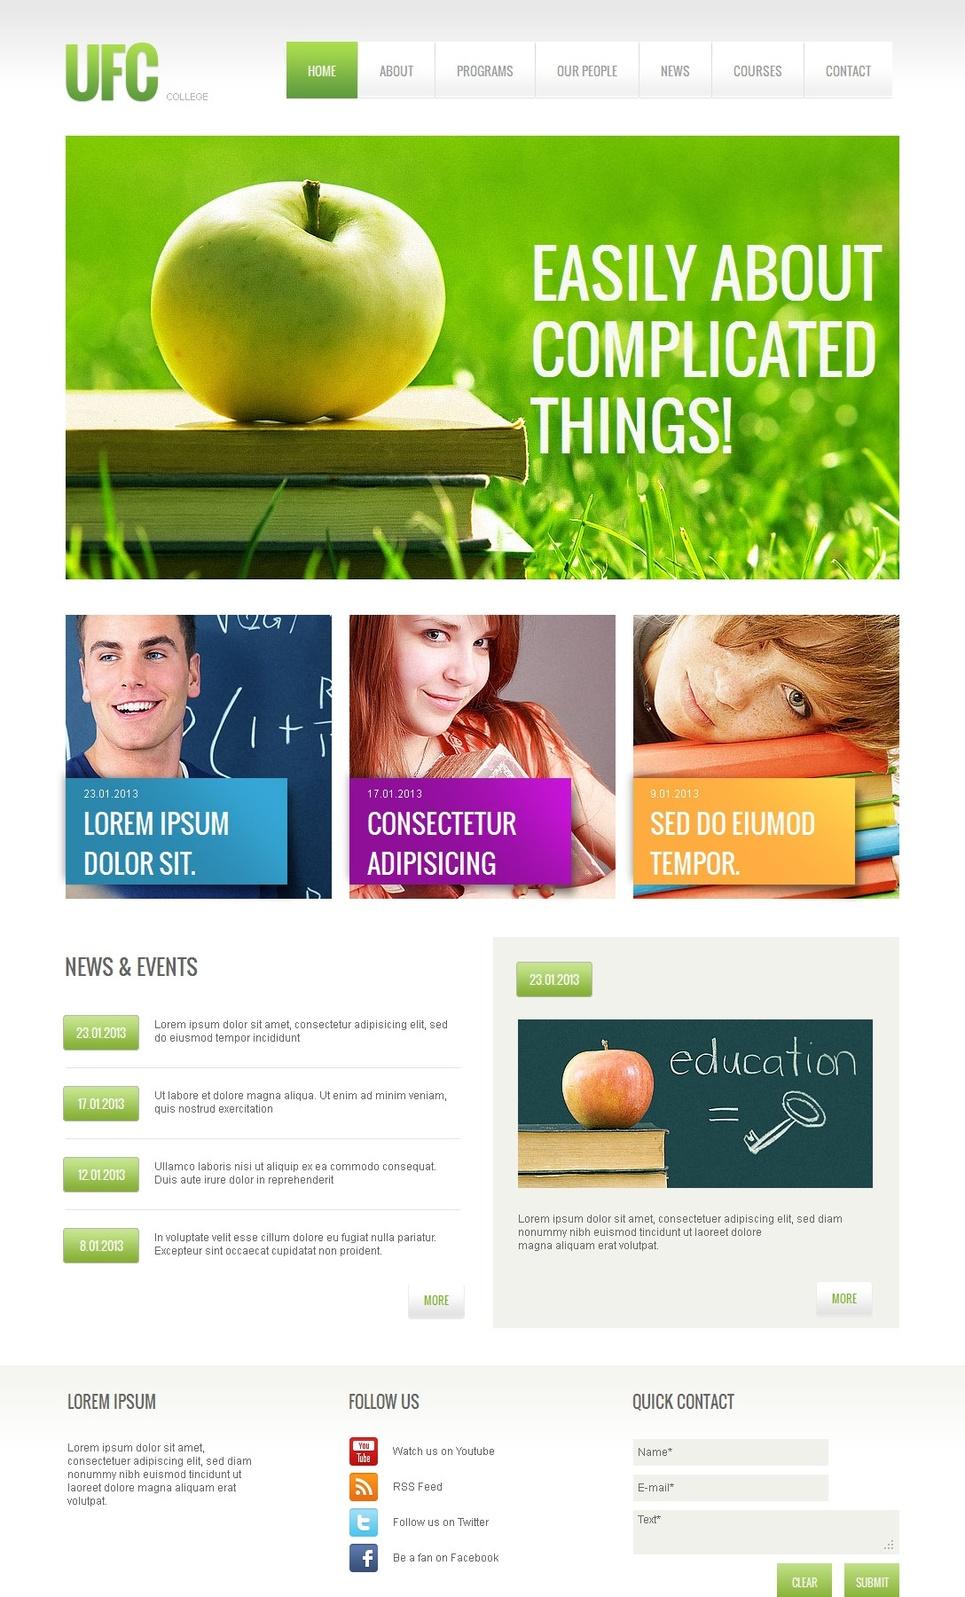 University Website Template for Better Education - image